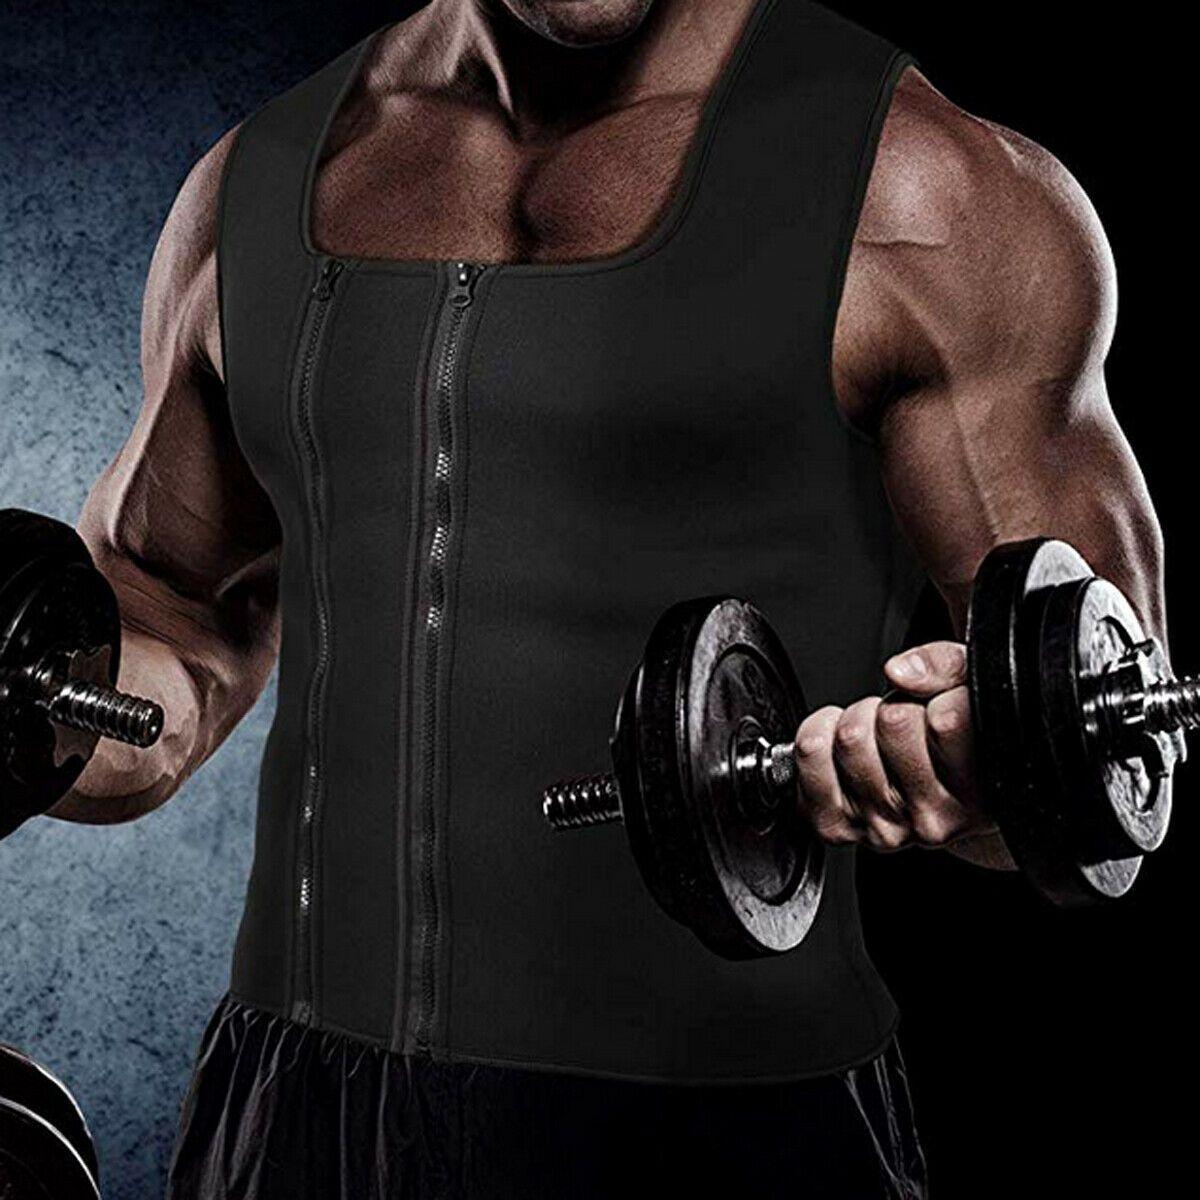 2019 Men 's Slimming Vest Black Zipper Neoprene Vest Sweat Shirt 몸 셰이퍼 허리 트레이너 Gym Slim 코르셋 Running Vest Shapewear